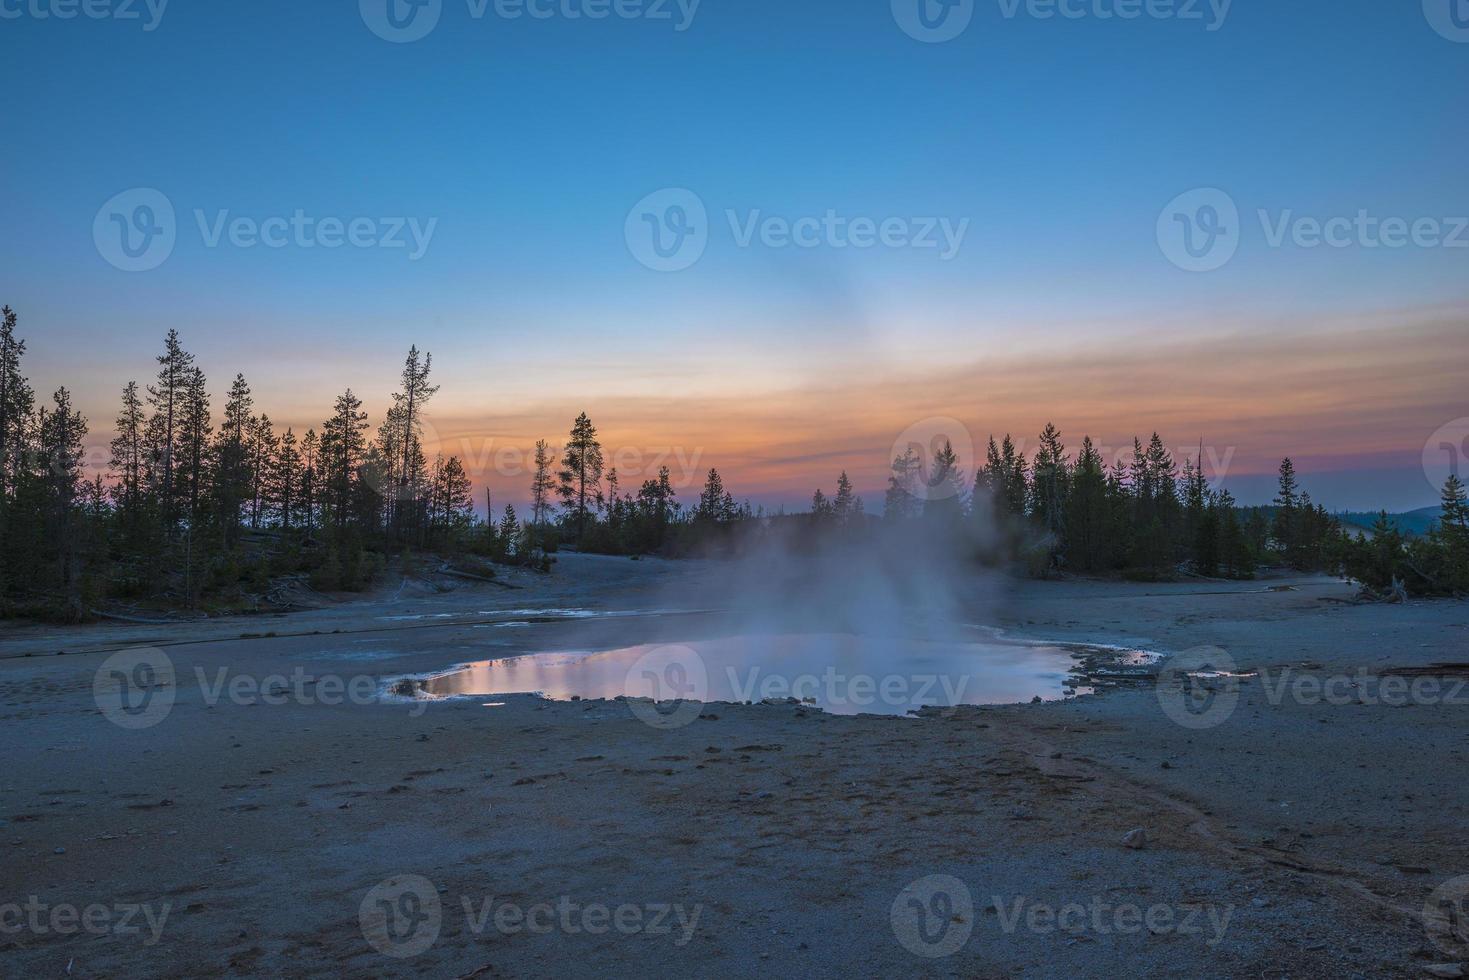 norris geiser bekken na zonsondergang foto